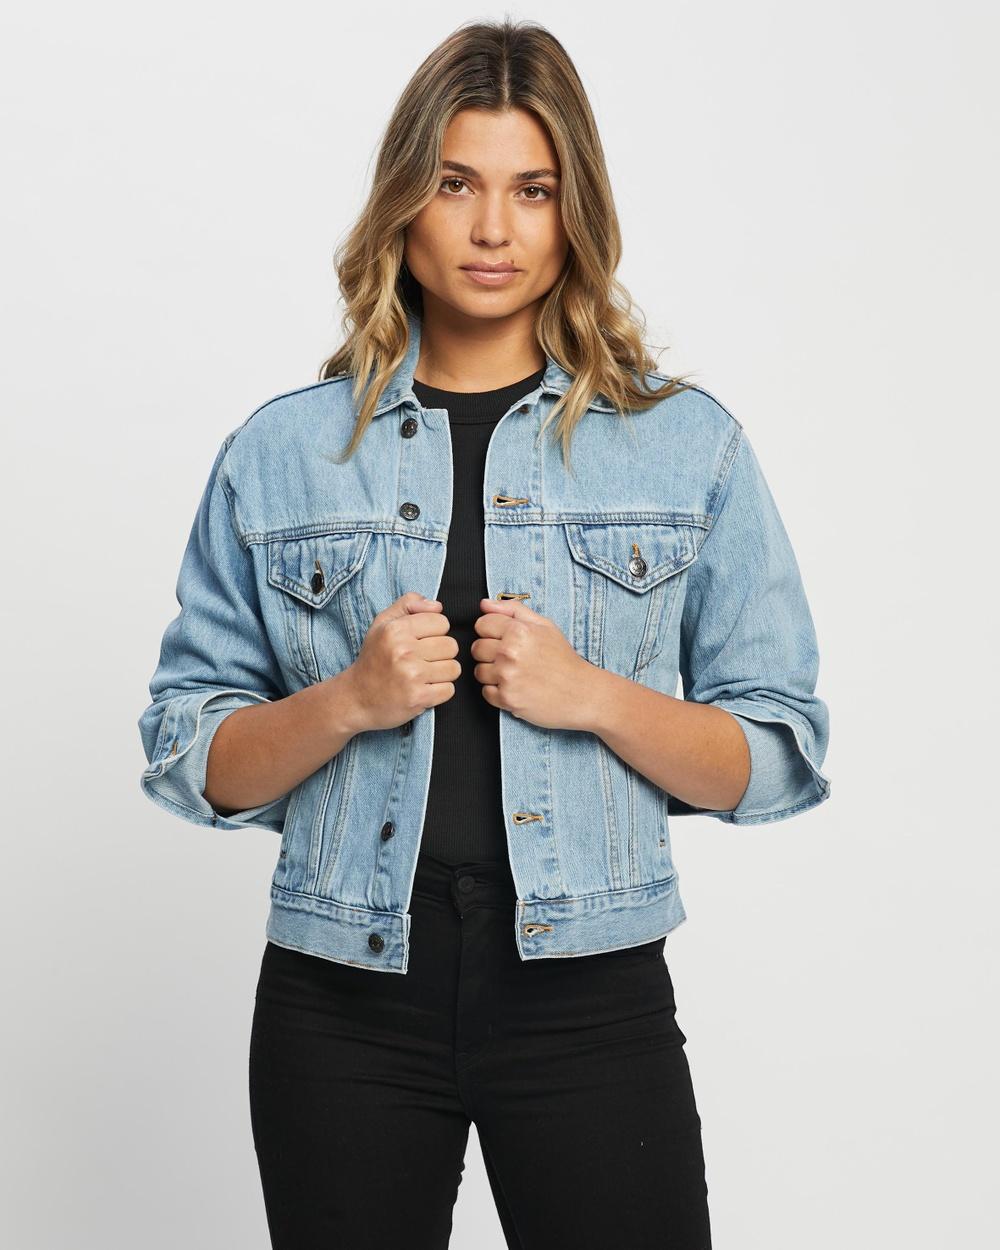 Atmos&Here Jackie Recycled Cotton Blend Denim Jacket jacket Vintage Blue Australia